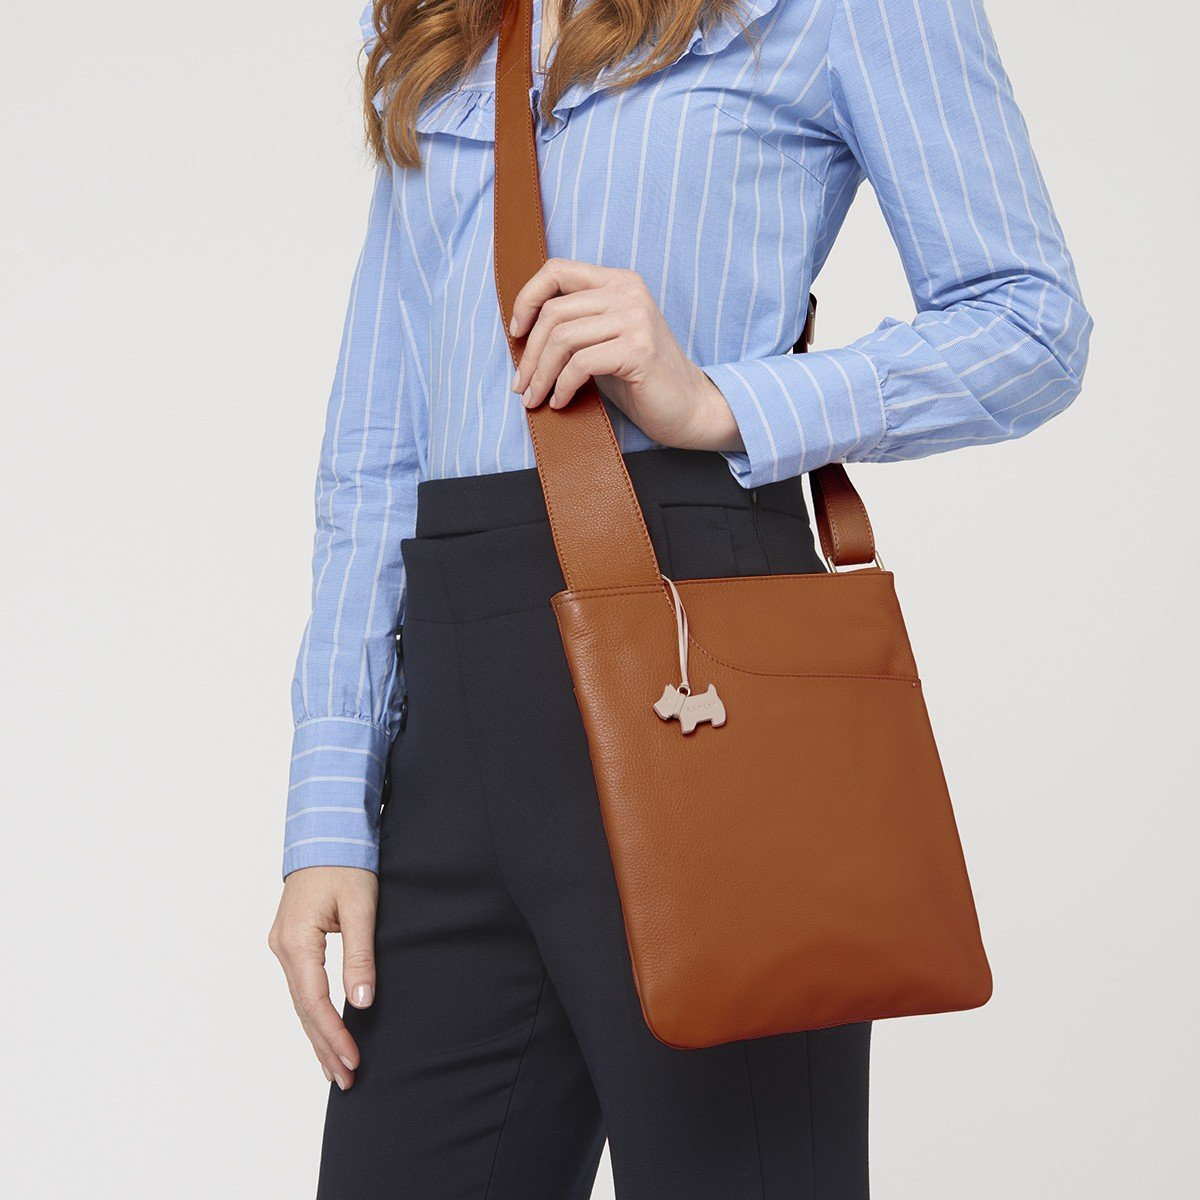 e1f45098362d Radley Handbag Pocket Bag. Medium Cross Body Bag 90102 Brown: Amazon.co.uk:  Shoes & Bags